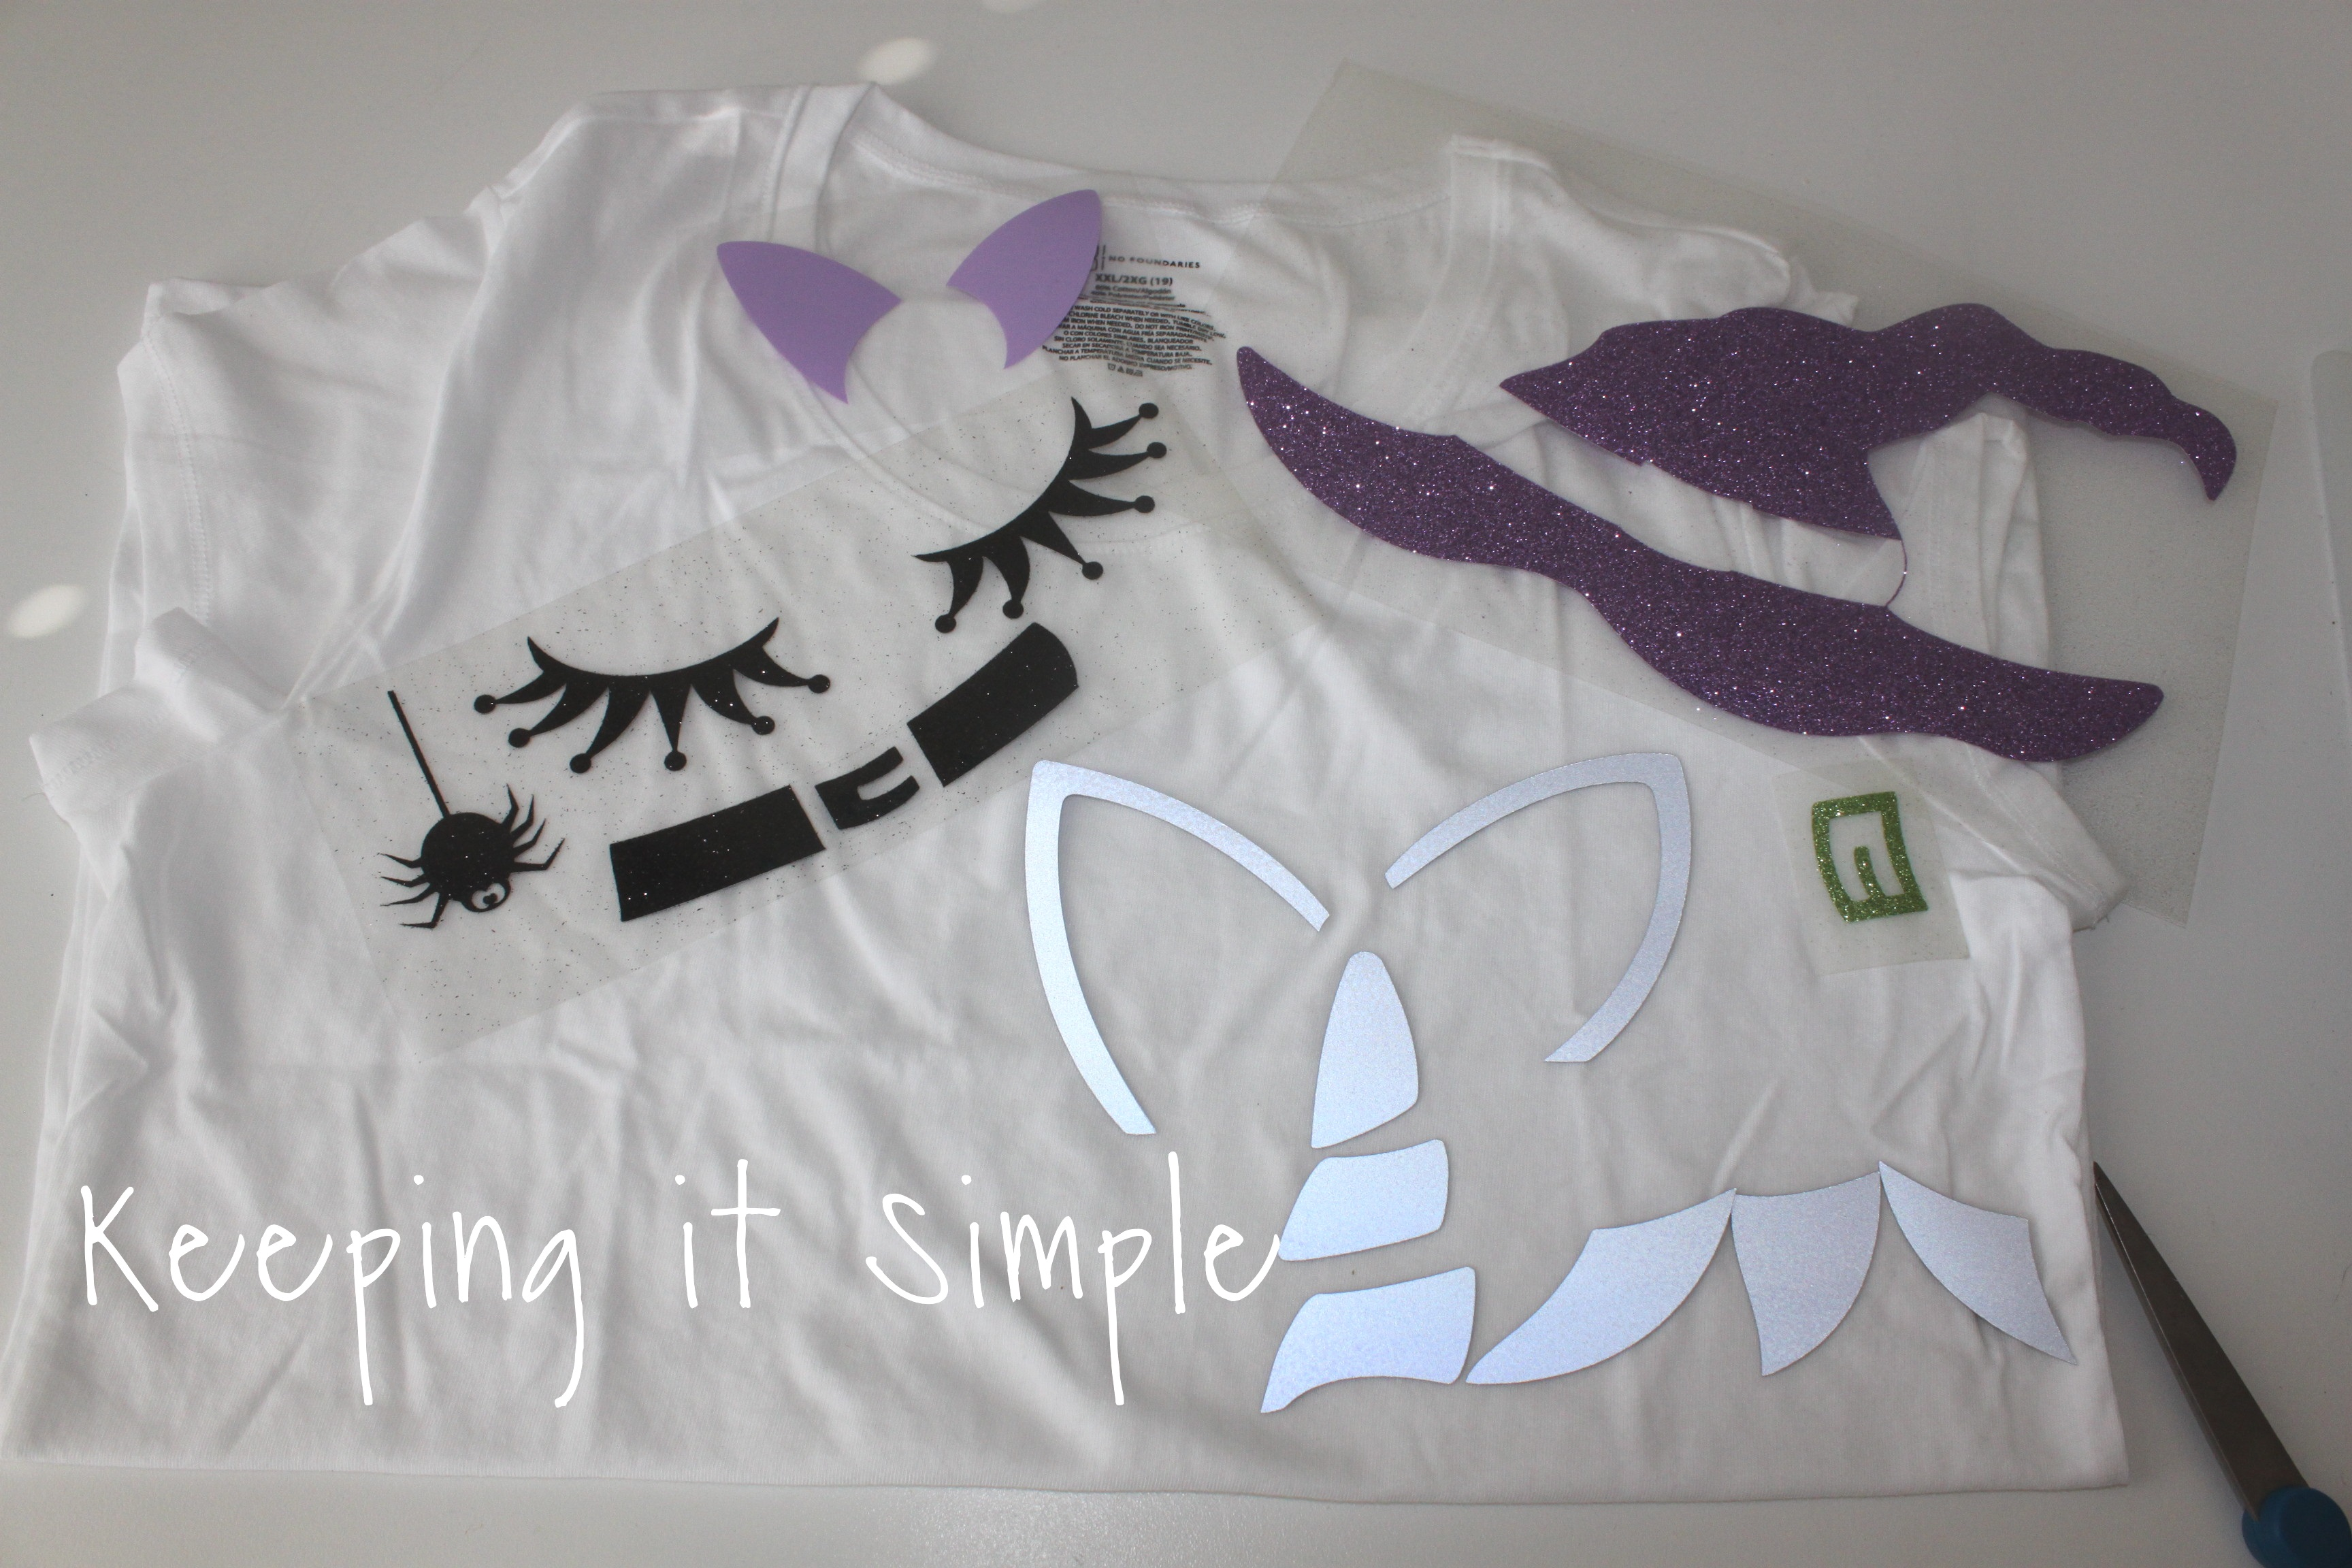 eda9ff16 girls-Halloween-shirt-unicorn-witch (4)2 • Keeping it Simple